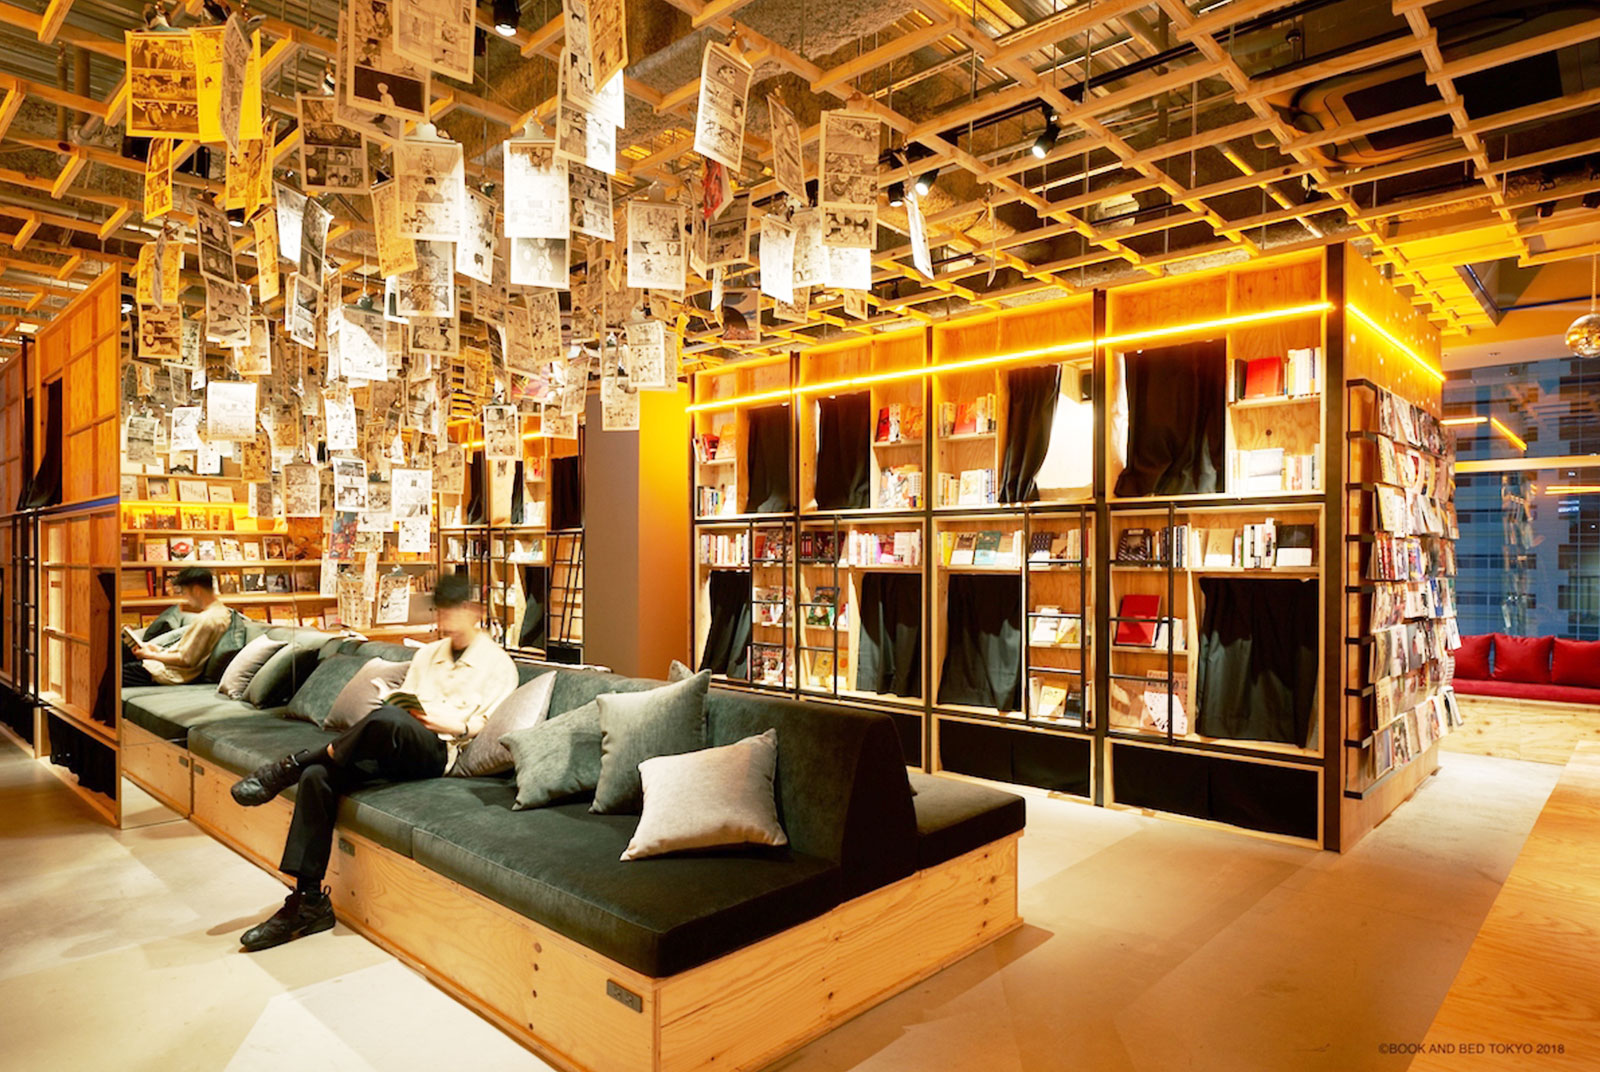 「SHIBUYA PUBLISHING & BOOKSELLERS」(渋谷区)が選書する幅広いジャンルの本が並ぶ